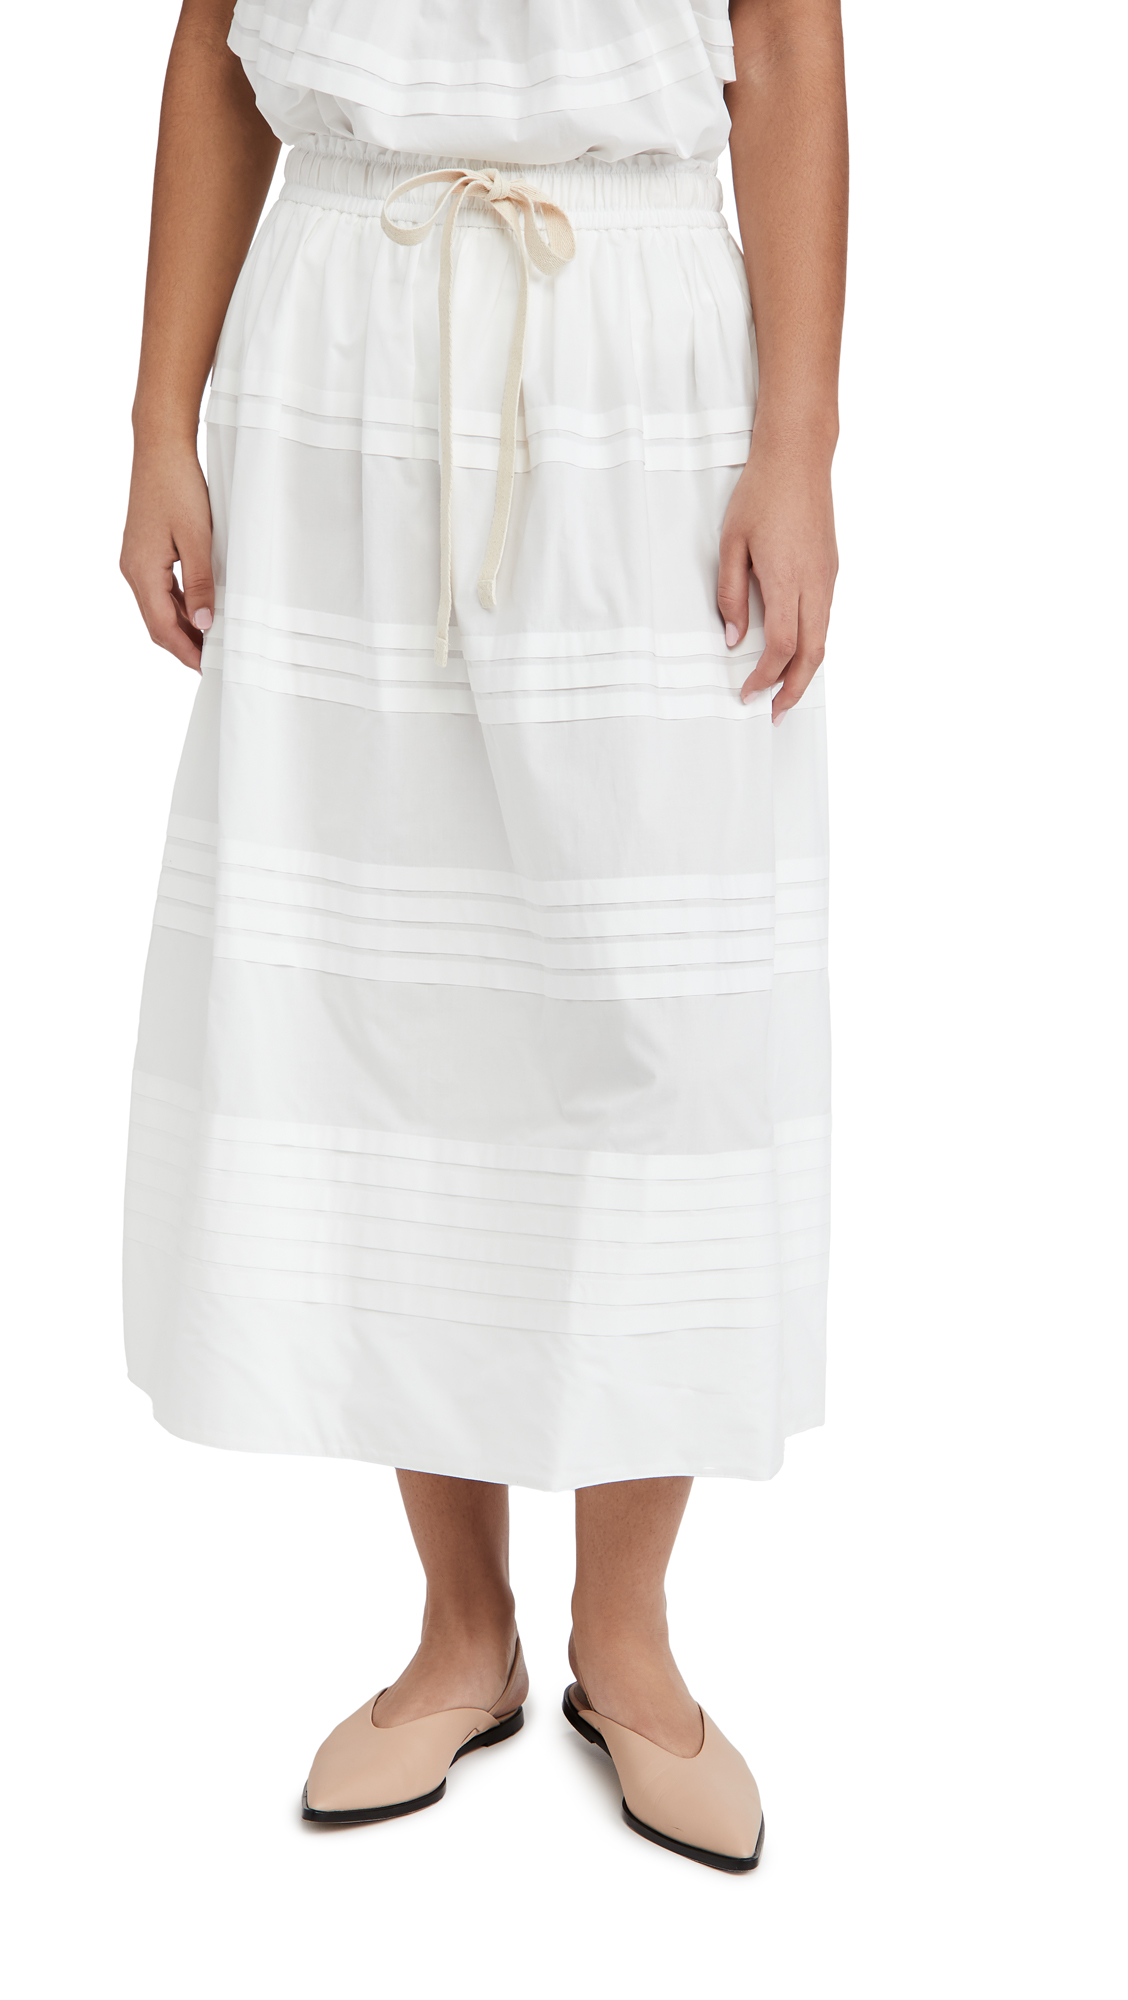 Lee Mathews Robin Pleat Skirt